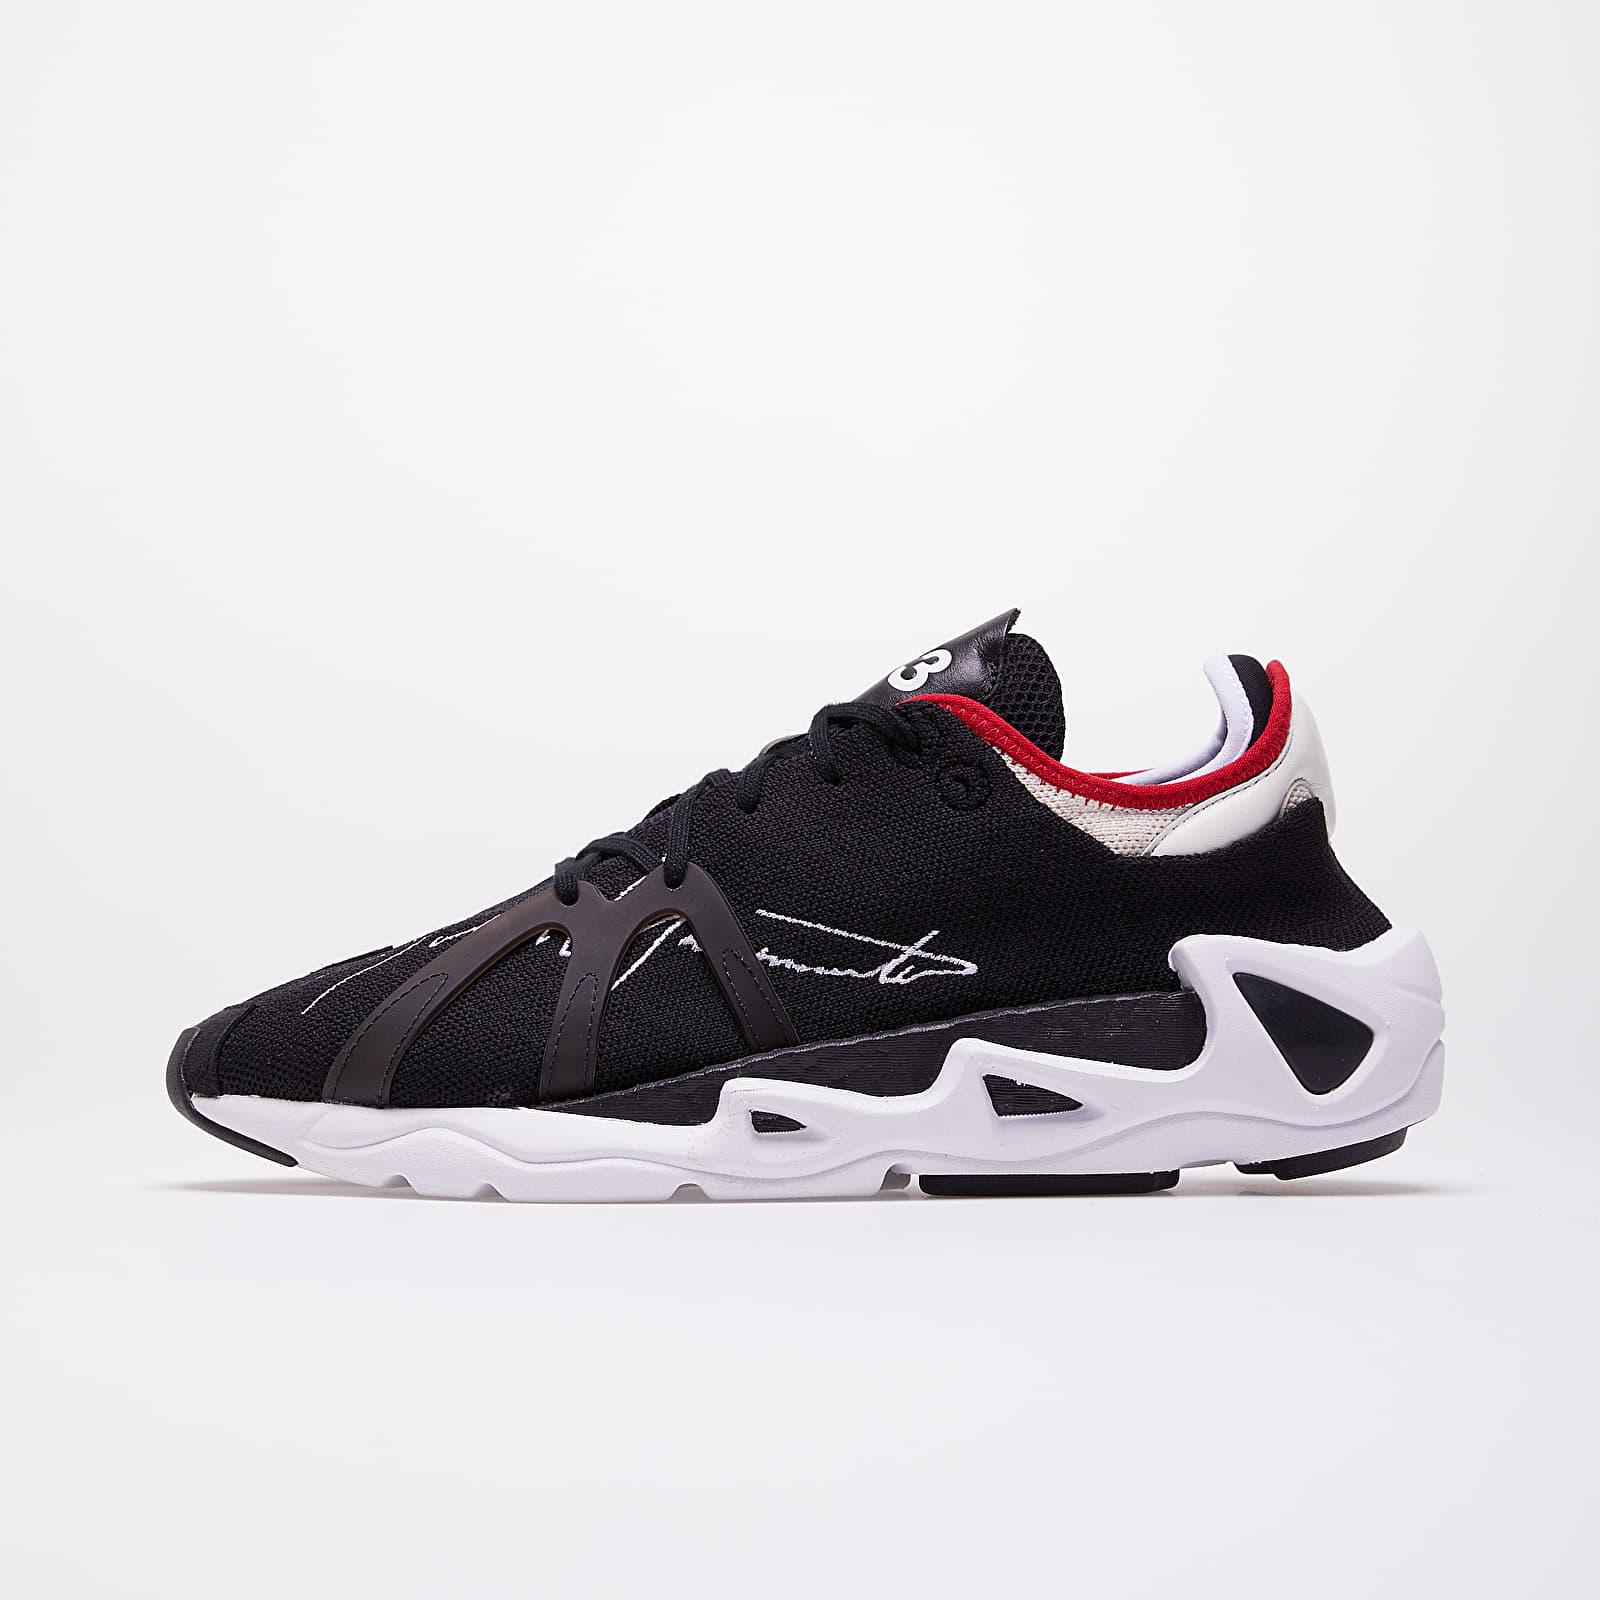 Men's shoes Y-3 FYW S-97 Black-Y3/ Ftwr White/ Black-Y3